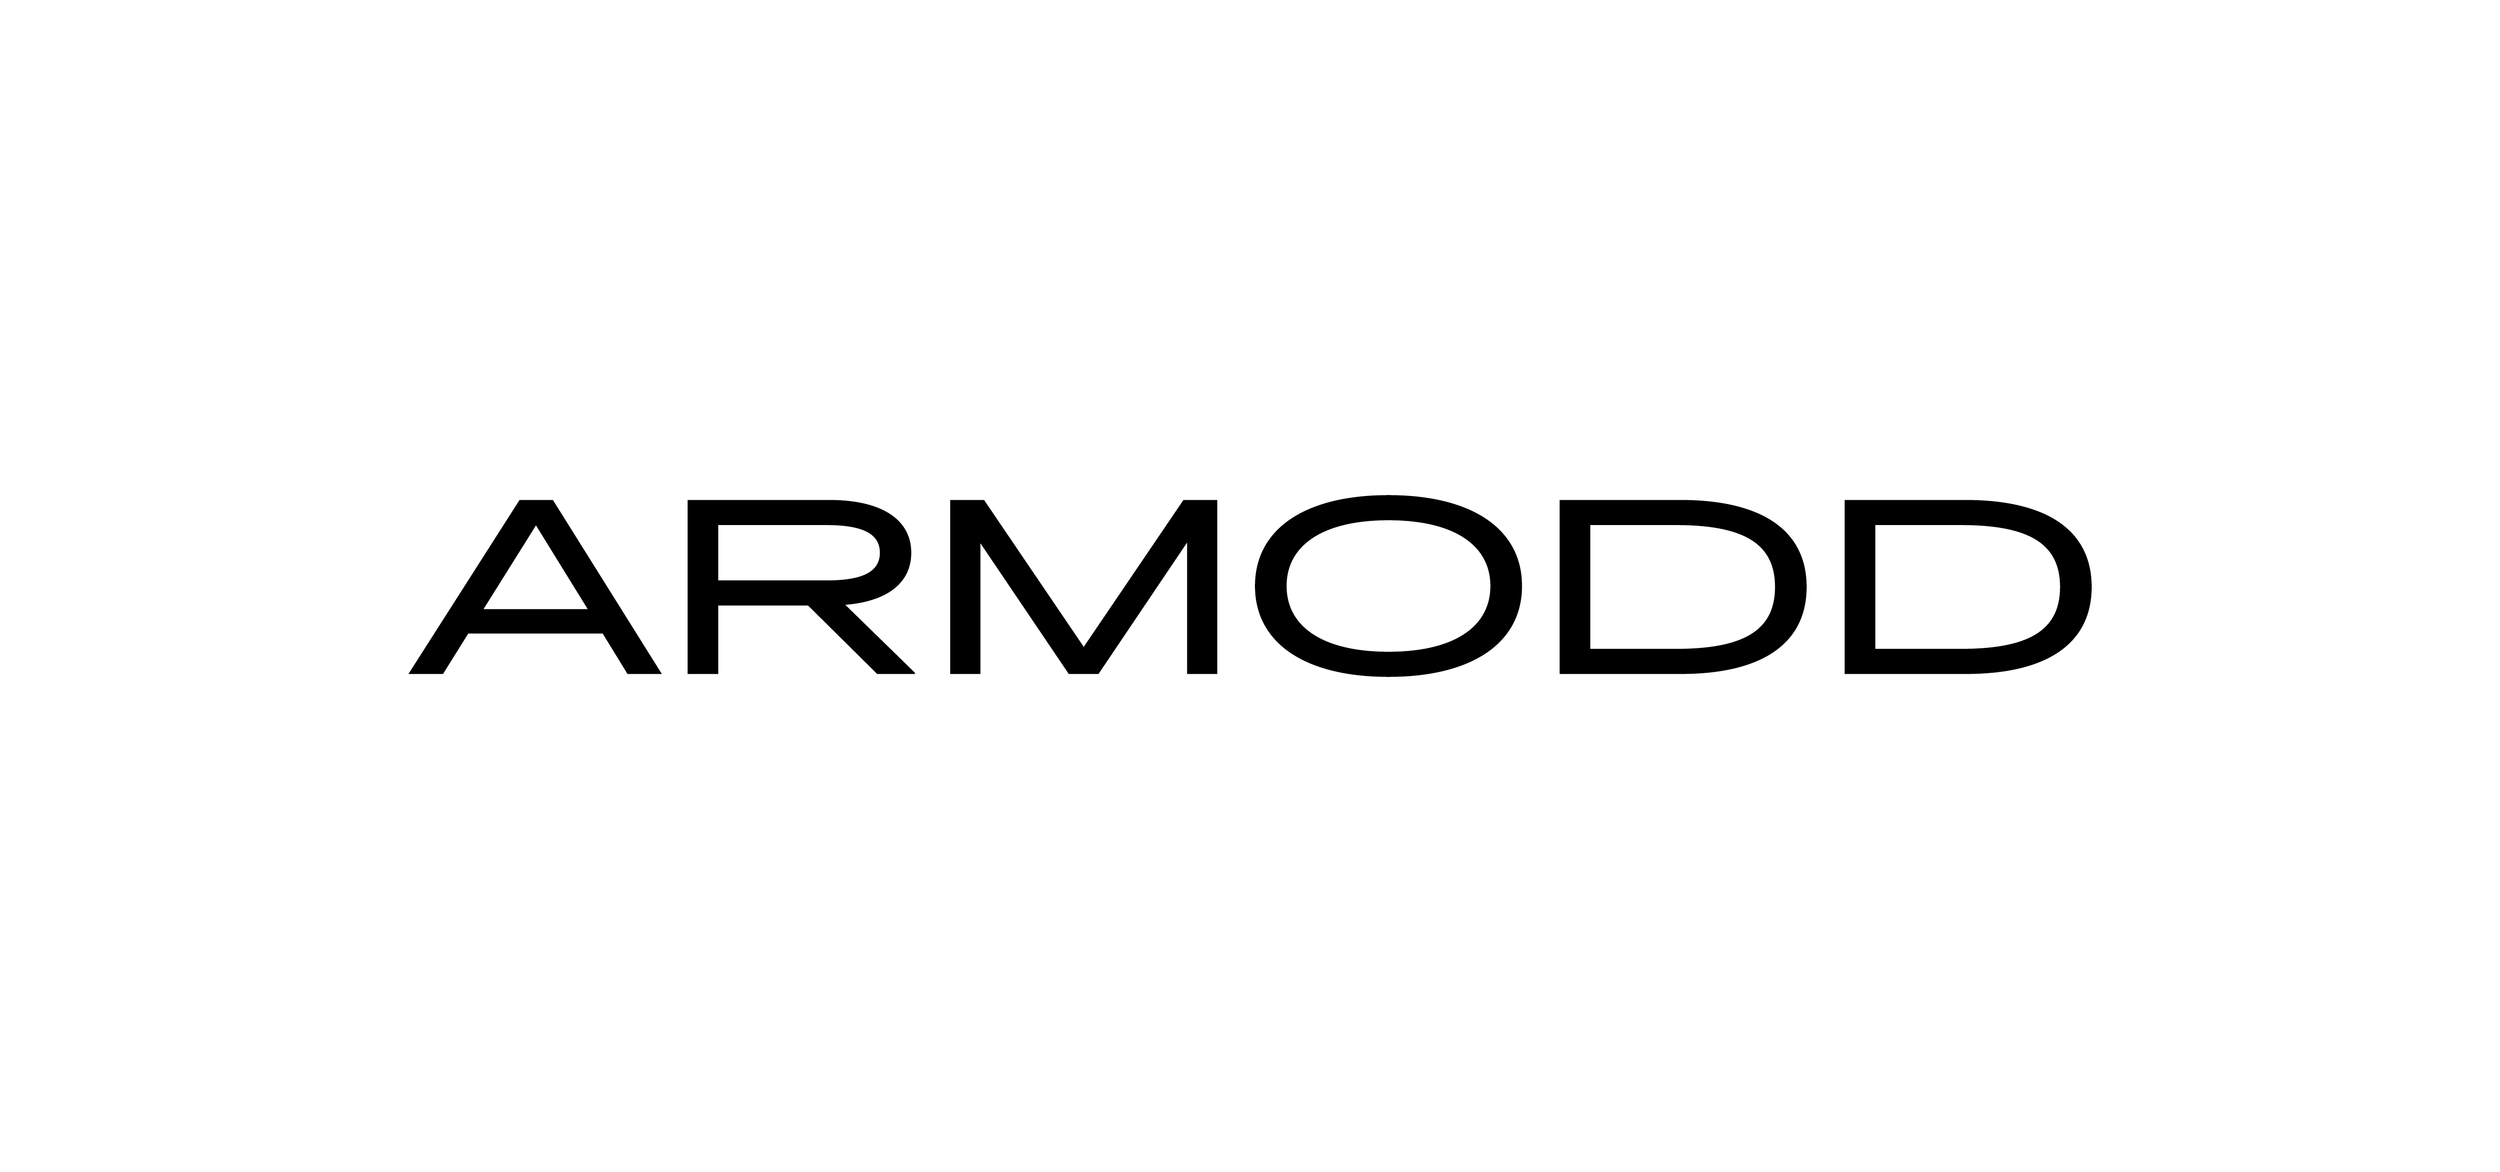 ARMODD_logo_pozitiv.png